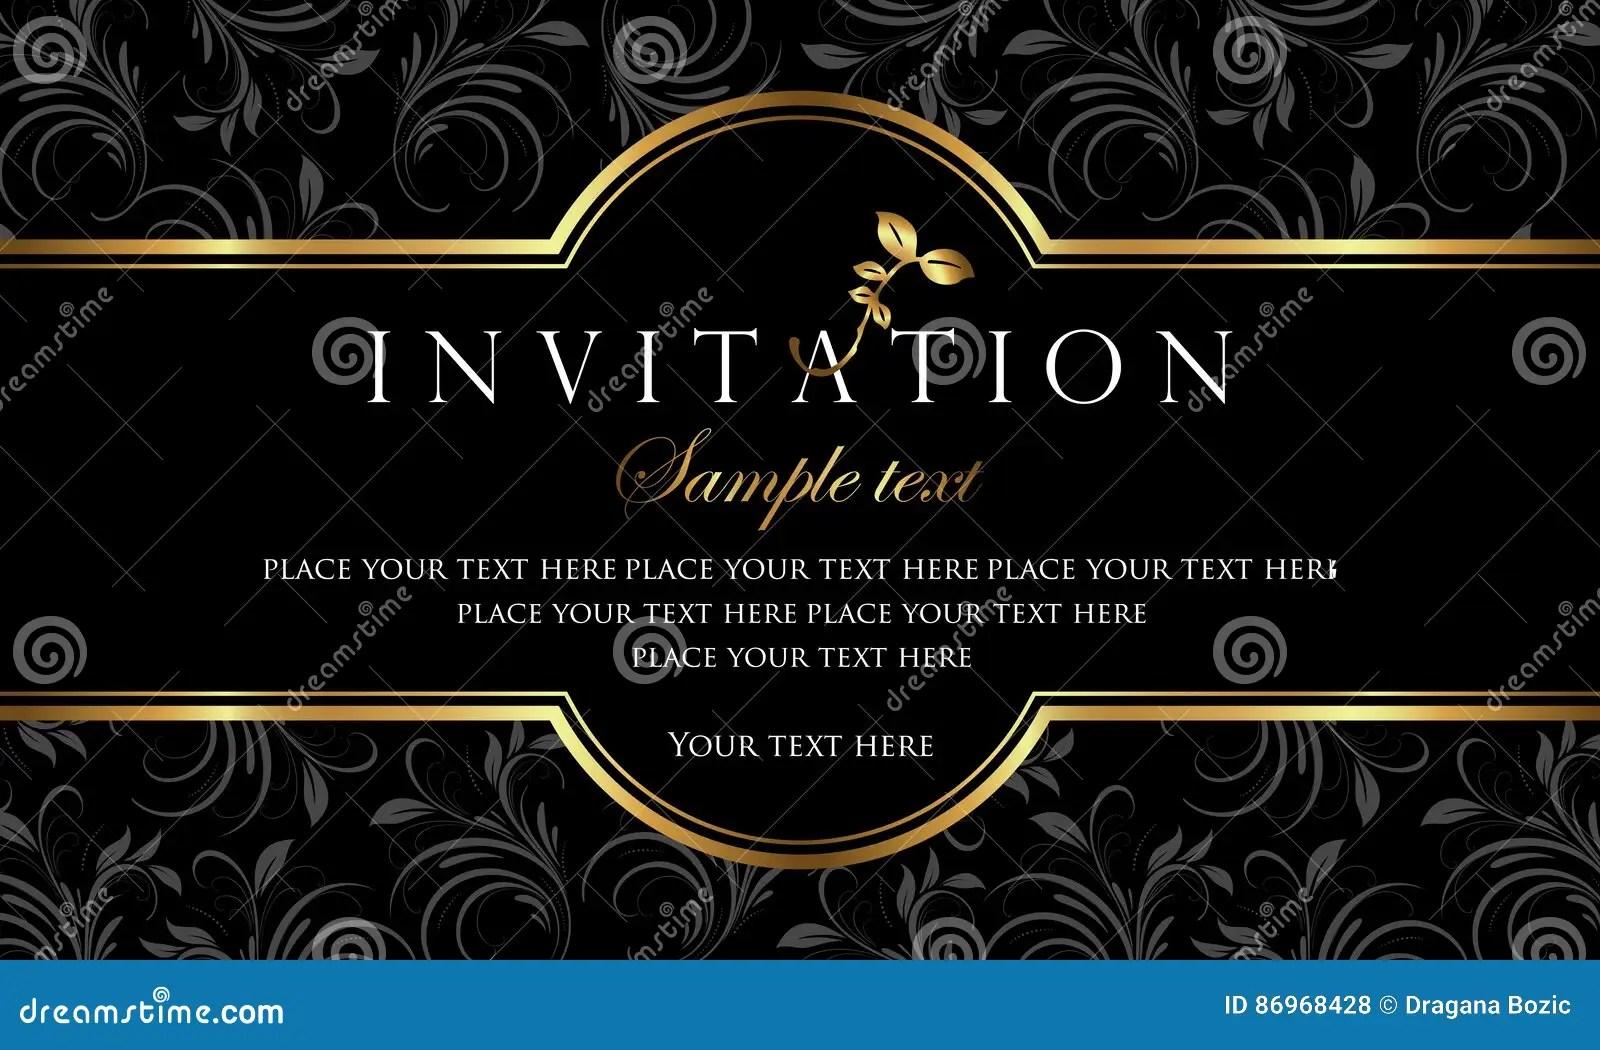 Invitation Card Design Luxury Black And Gold Retro Style Stock Vector Illustration Of Golden